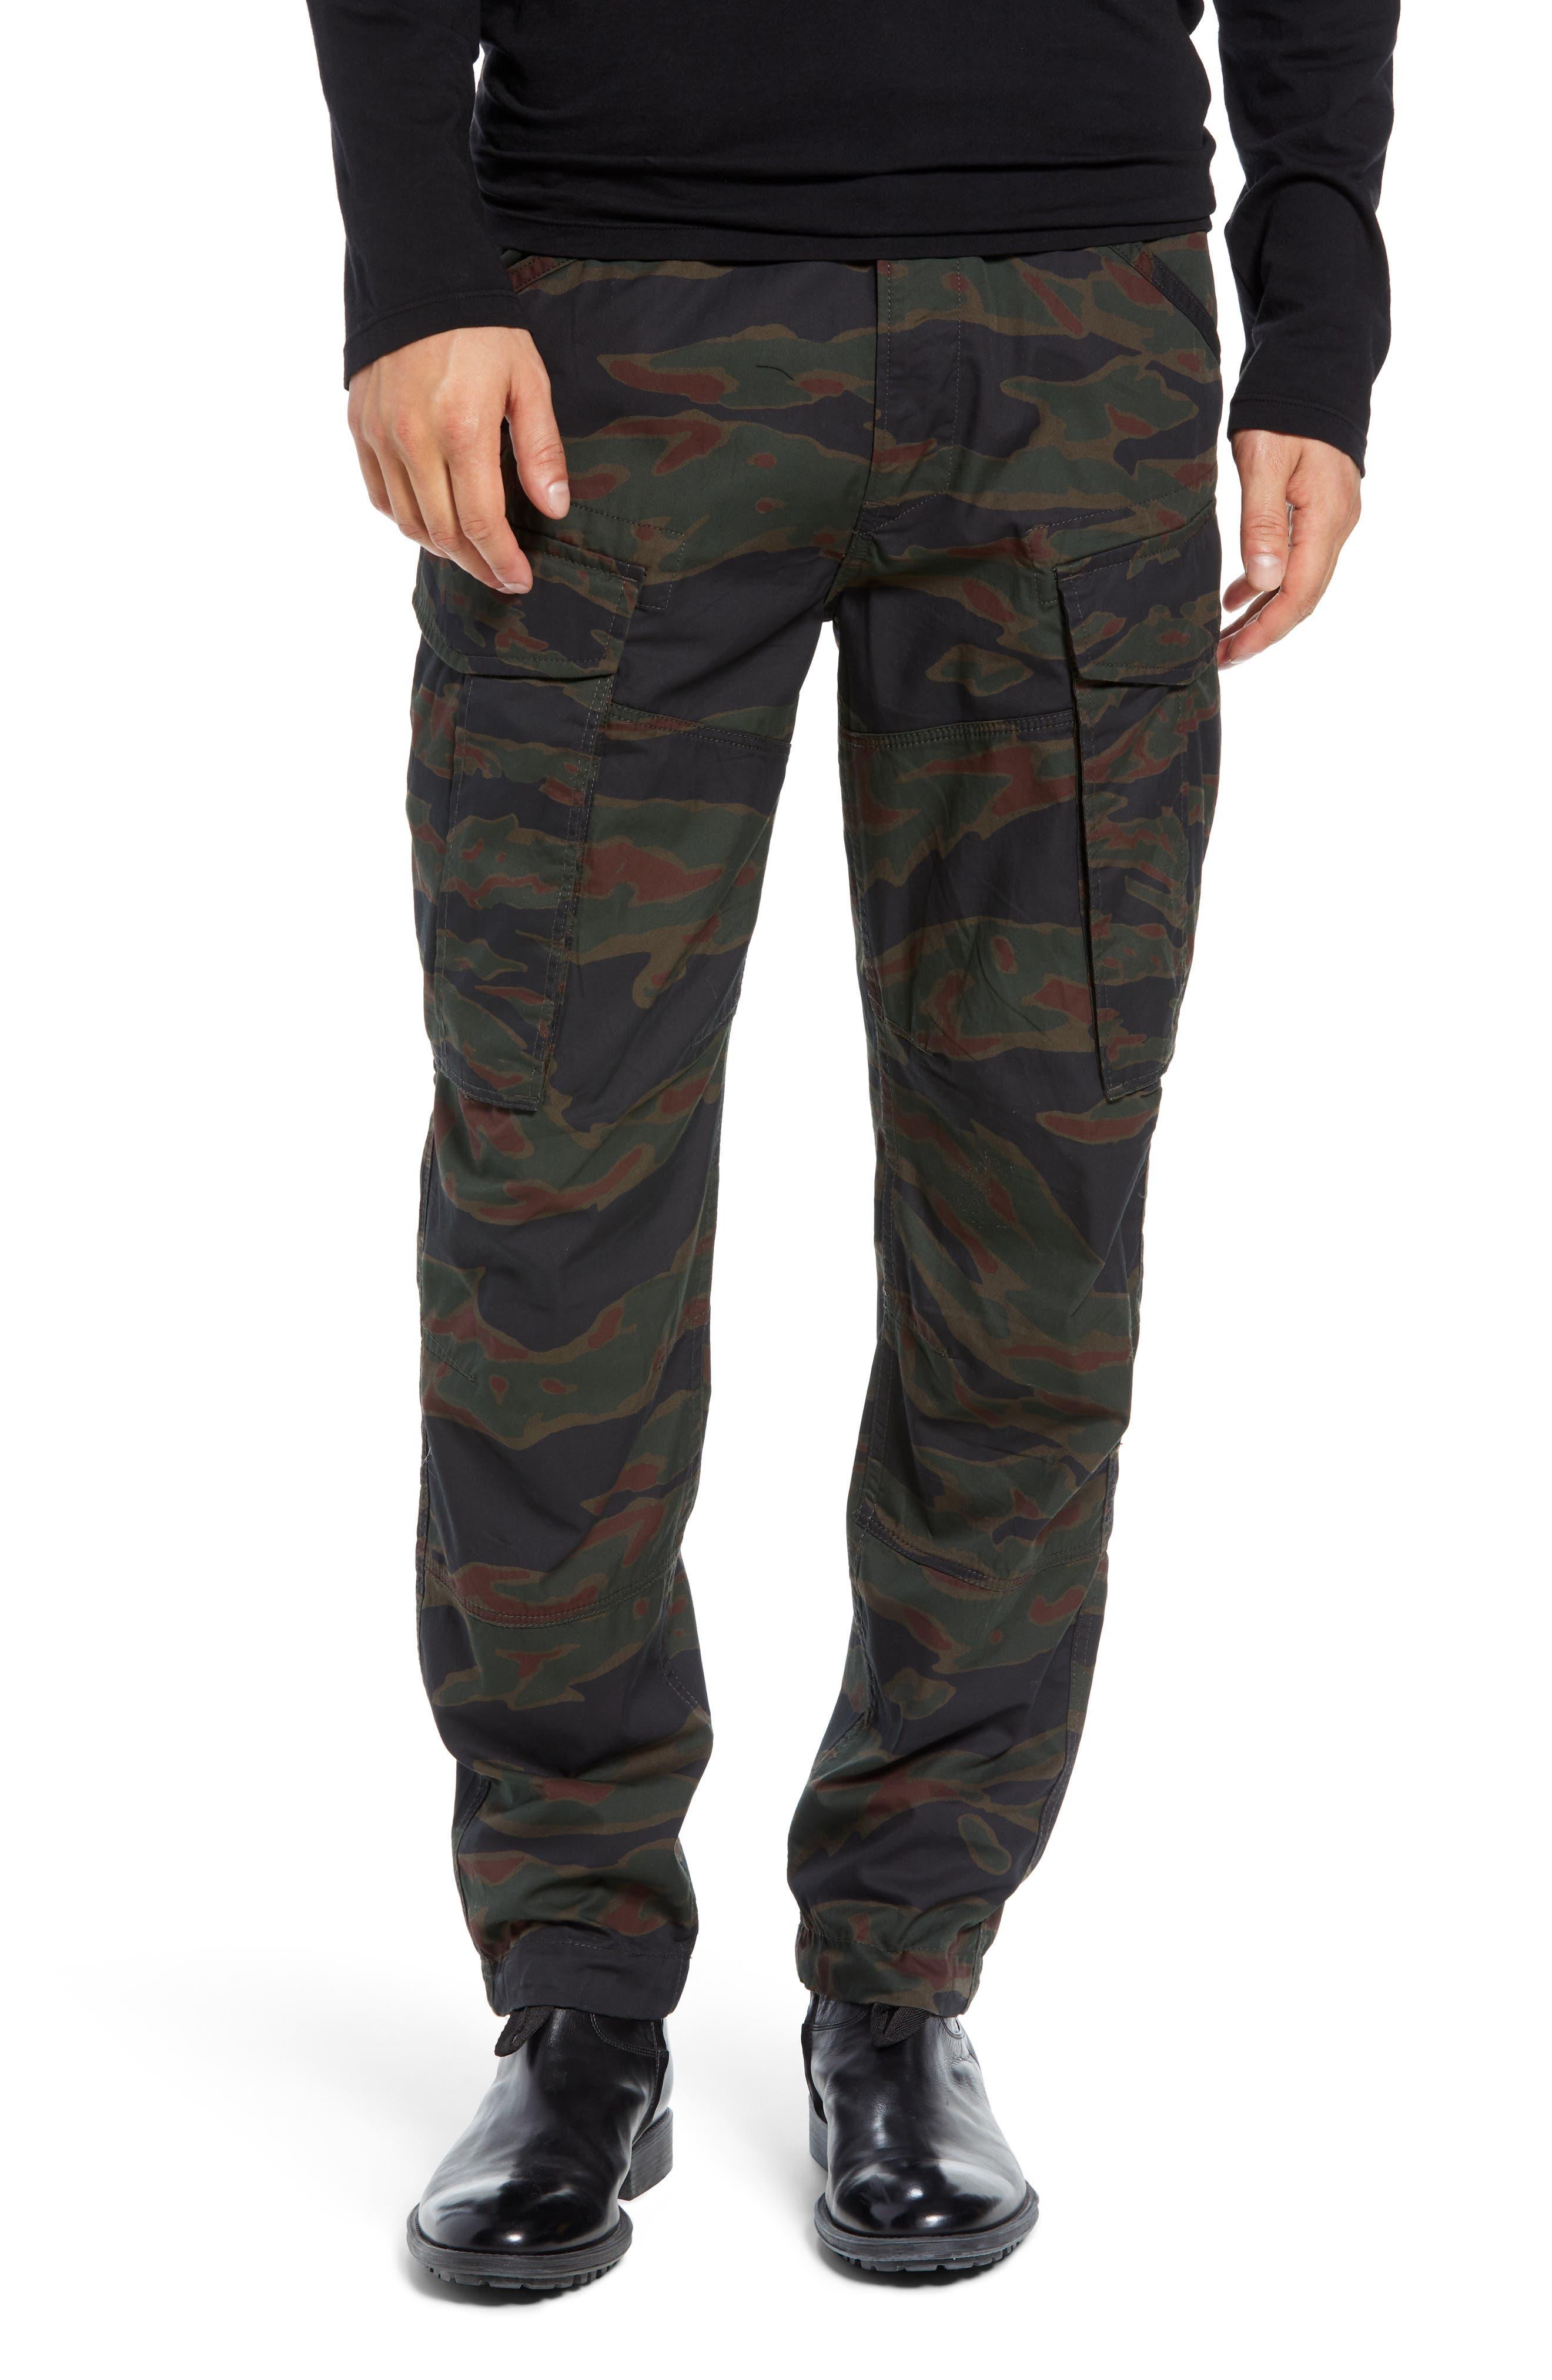 Rovic Tapered Cargo Pants,                         Main,                         color, SMOKE GREEN/ DARK VERMO